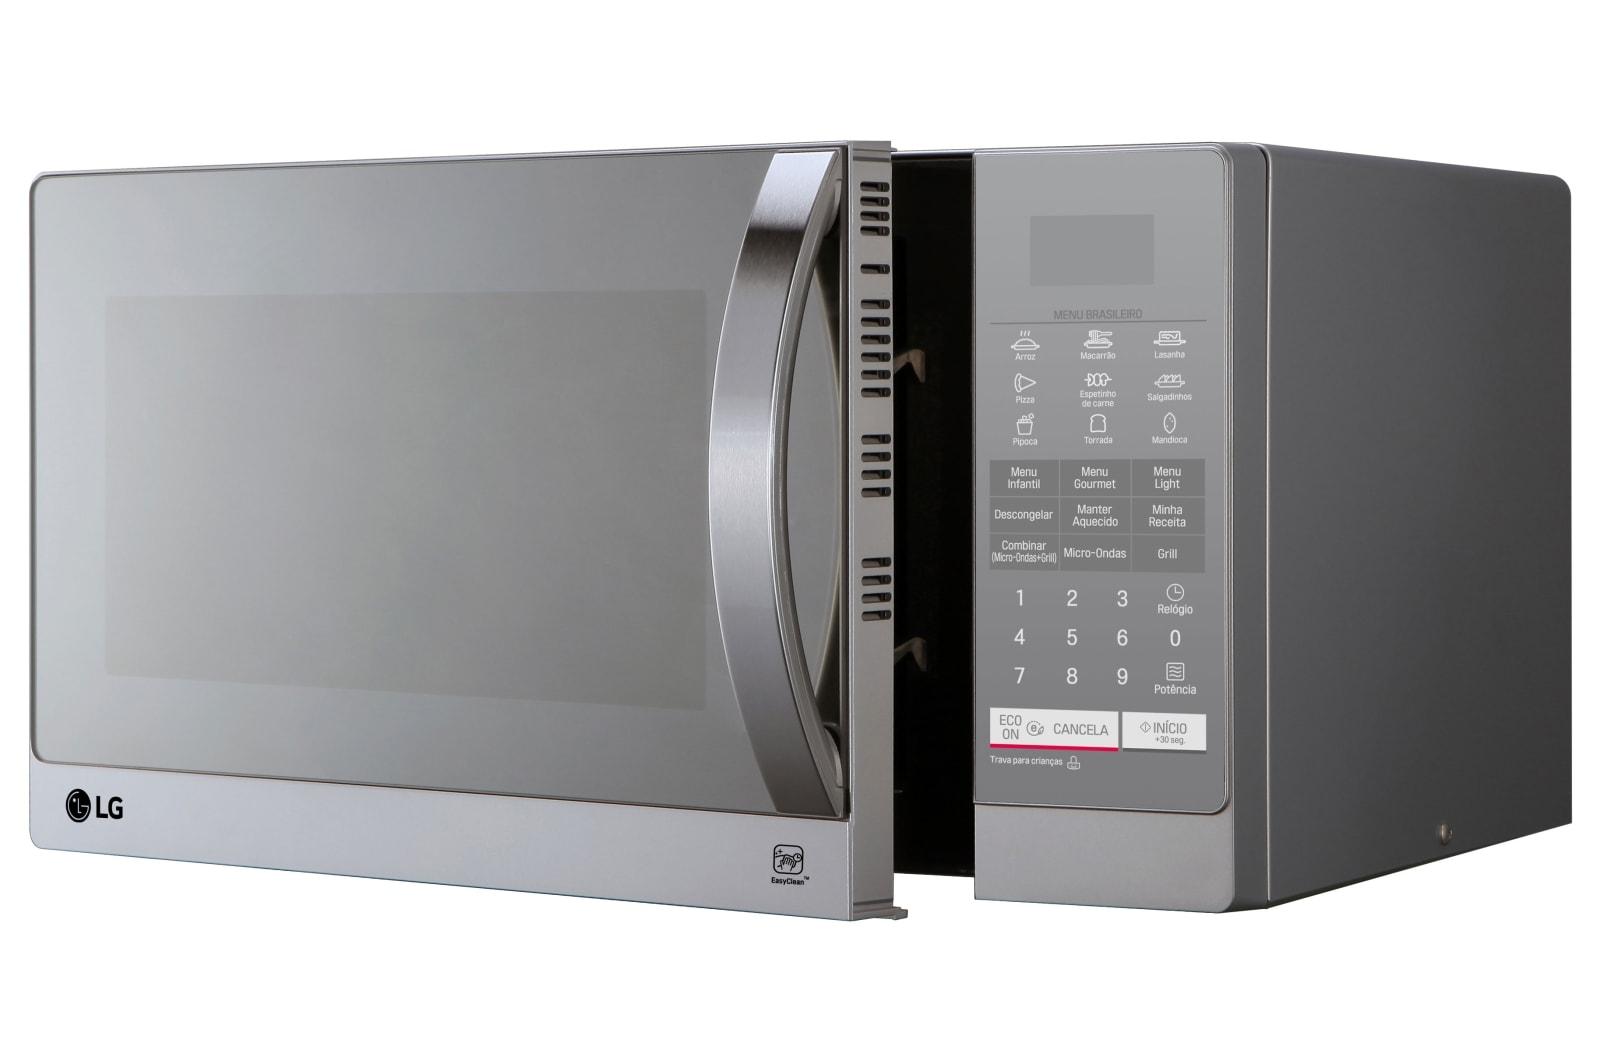 3e1050fe1 Micro-Ondas Prata LG Grill